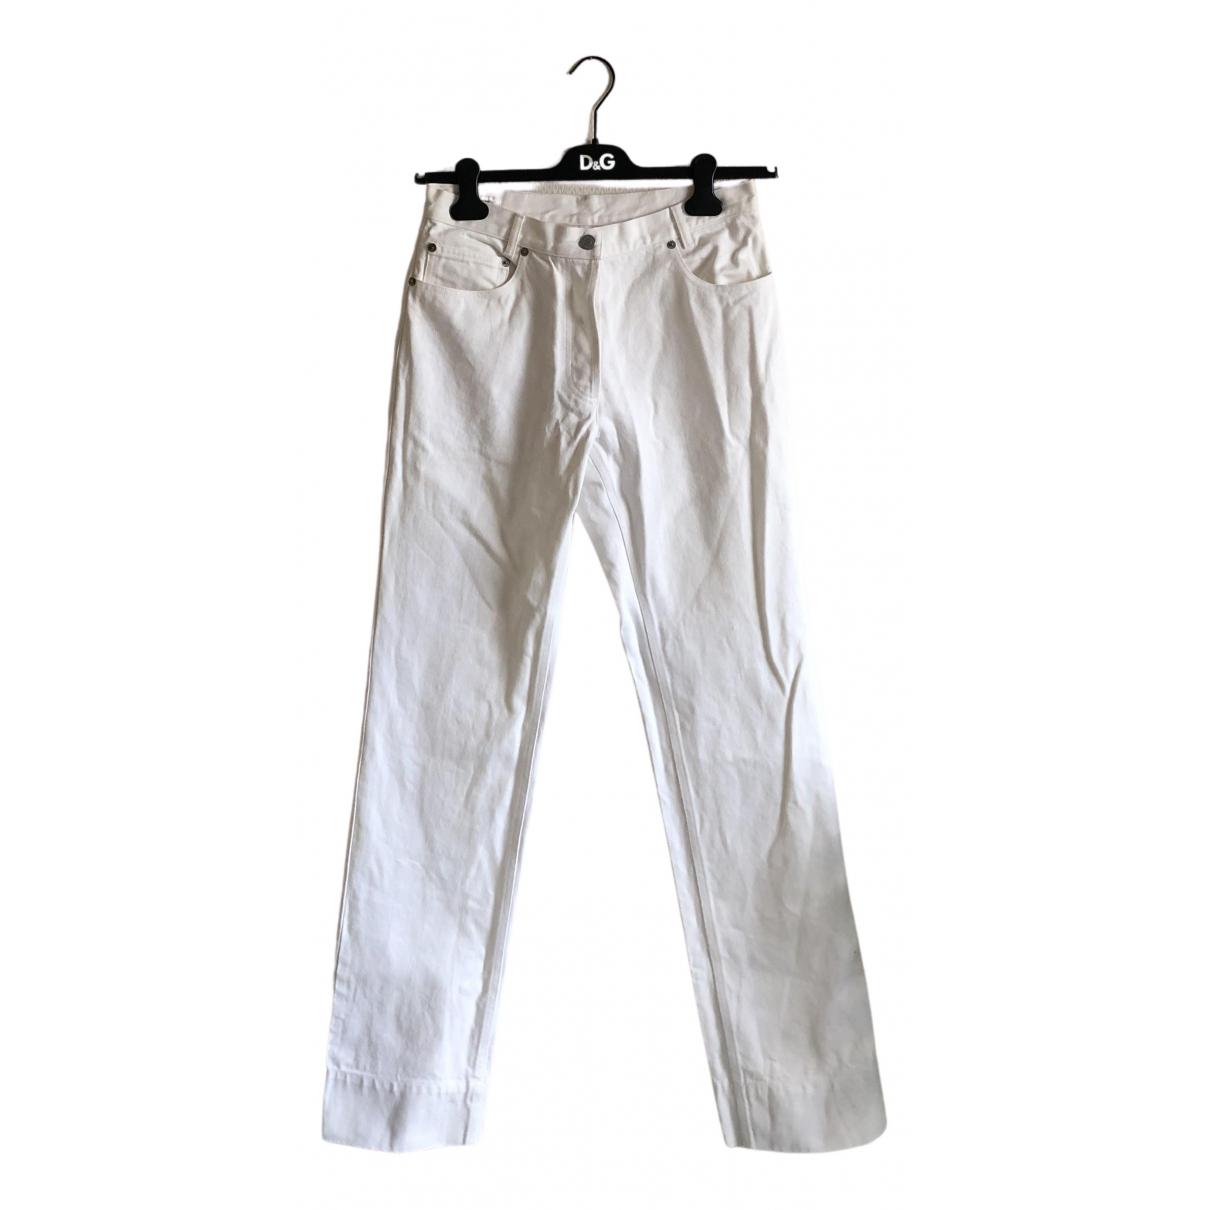 Dries Van Noten N White Cotton Jeans for Women 29 US